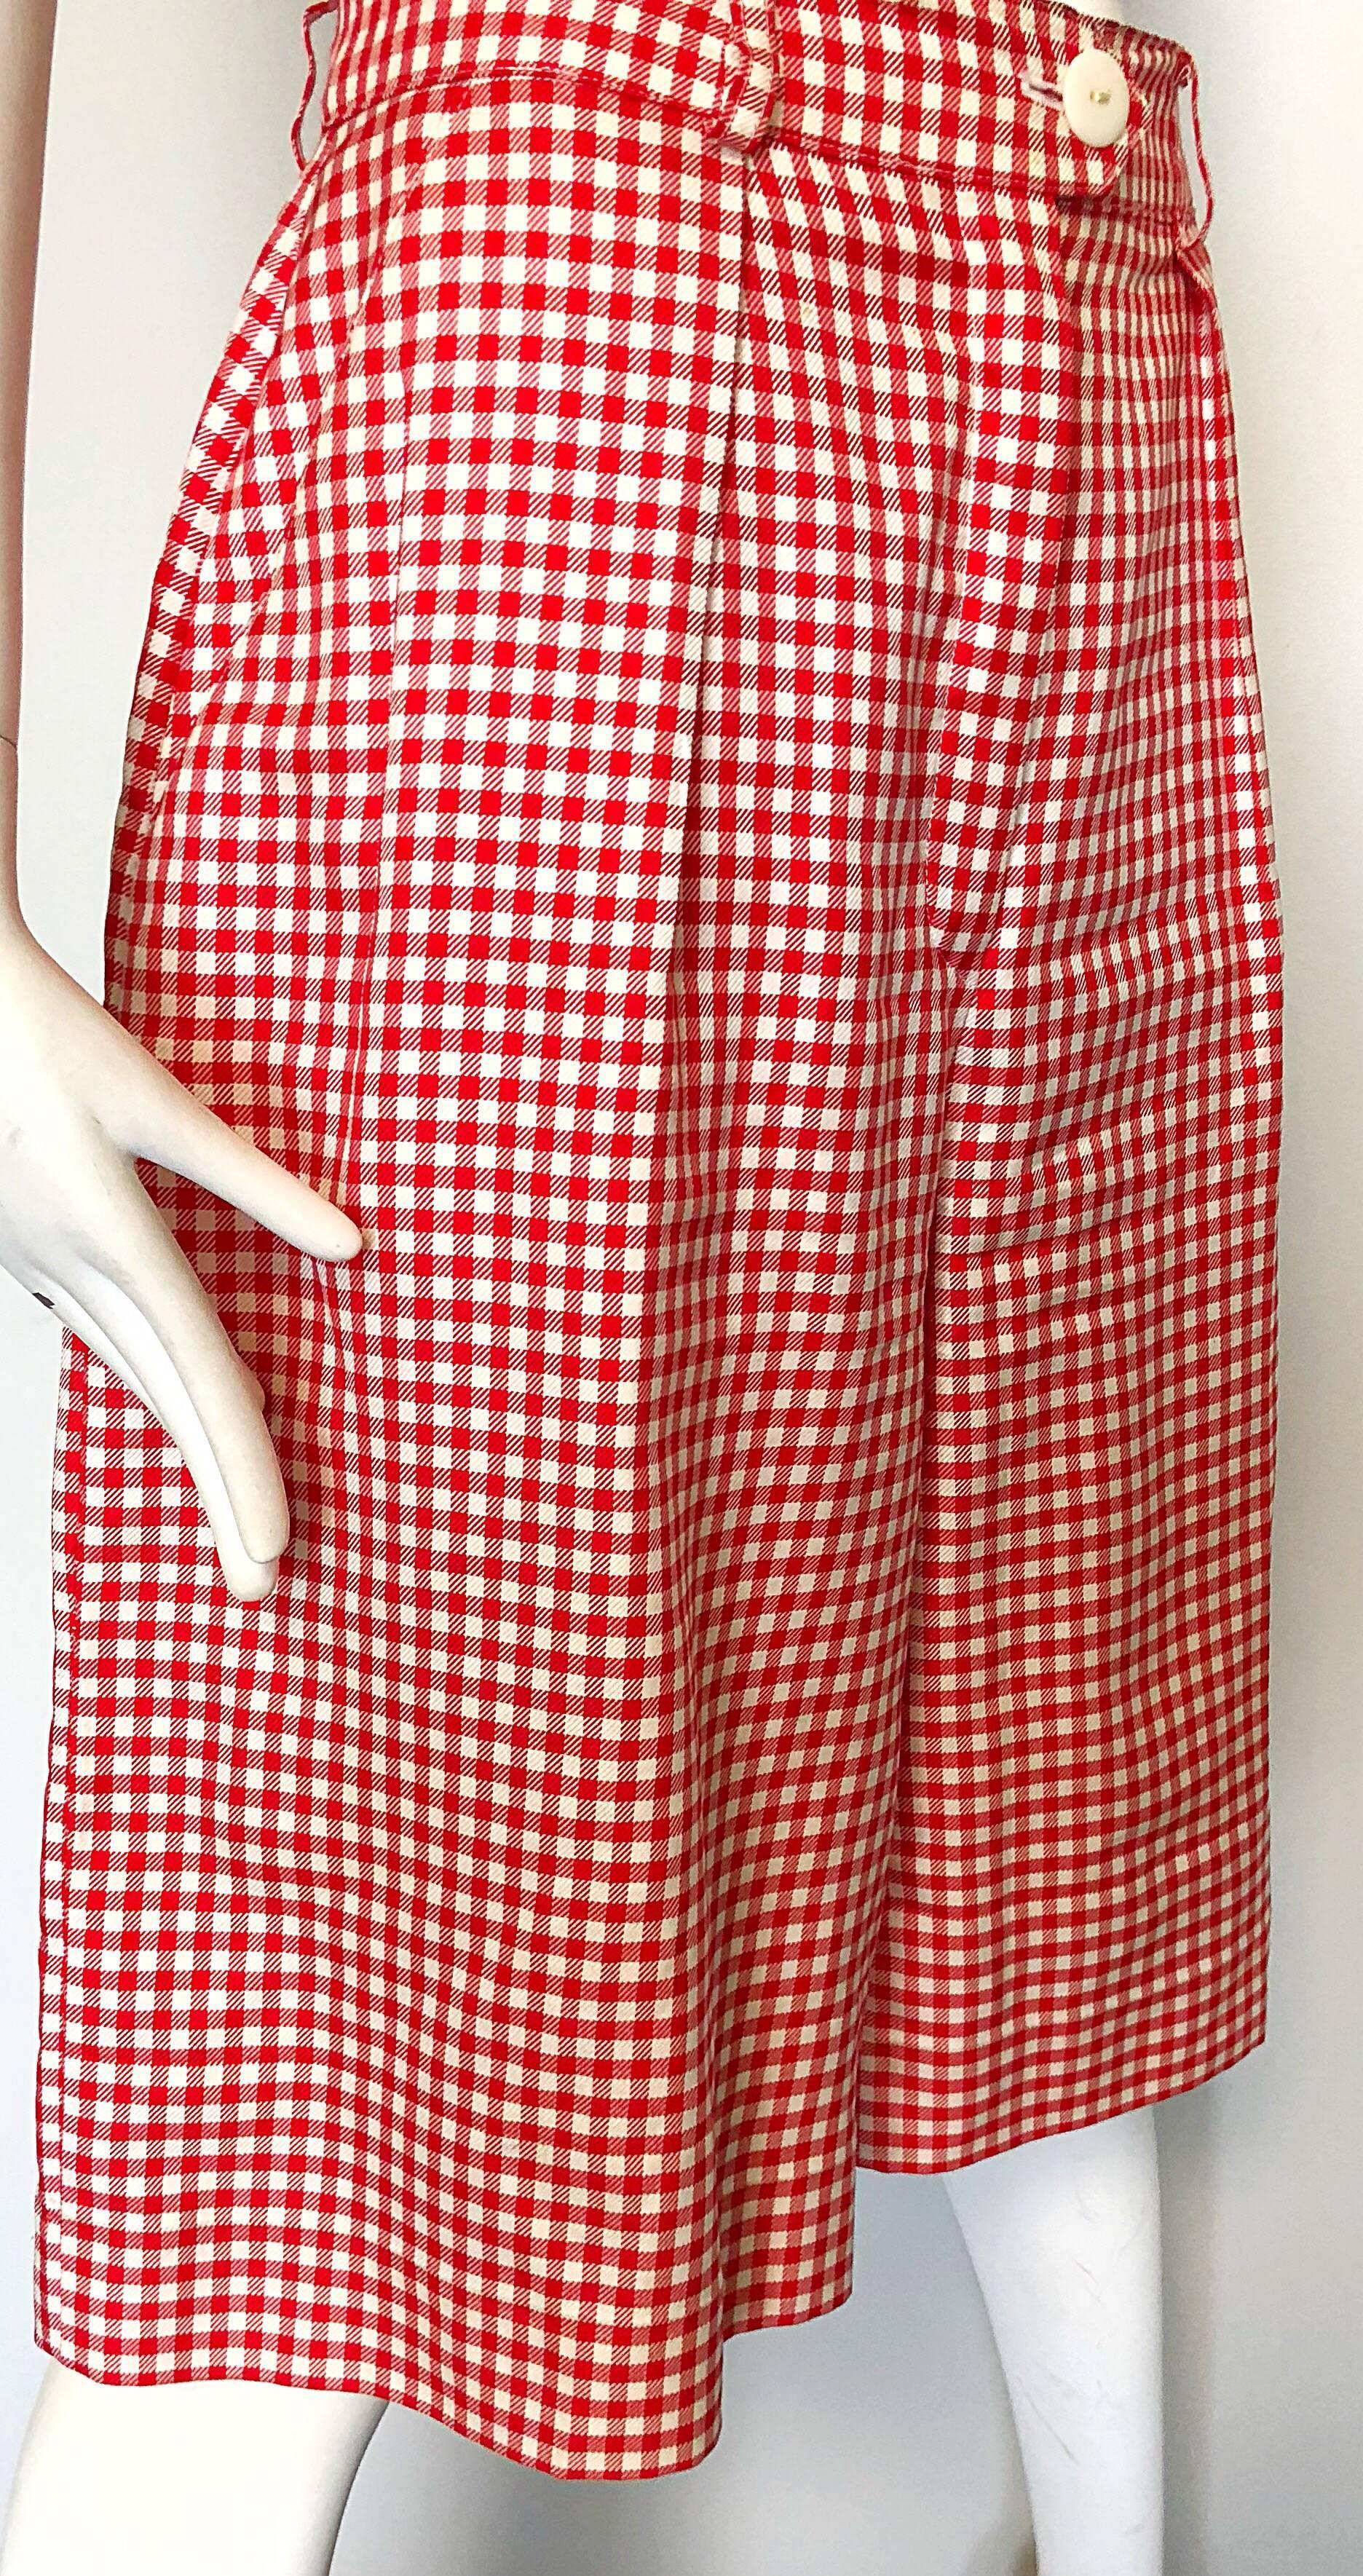 Vintage Escada Shorts  80s Wool plaid shorts  Retro Escada Pants  Wool shorts  Size 34 small  Designer Margaretha Ley  Blue yellow